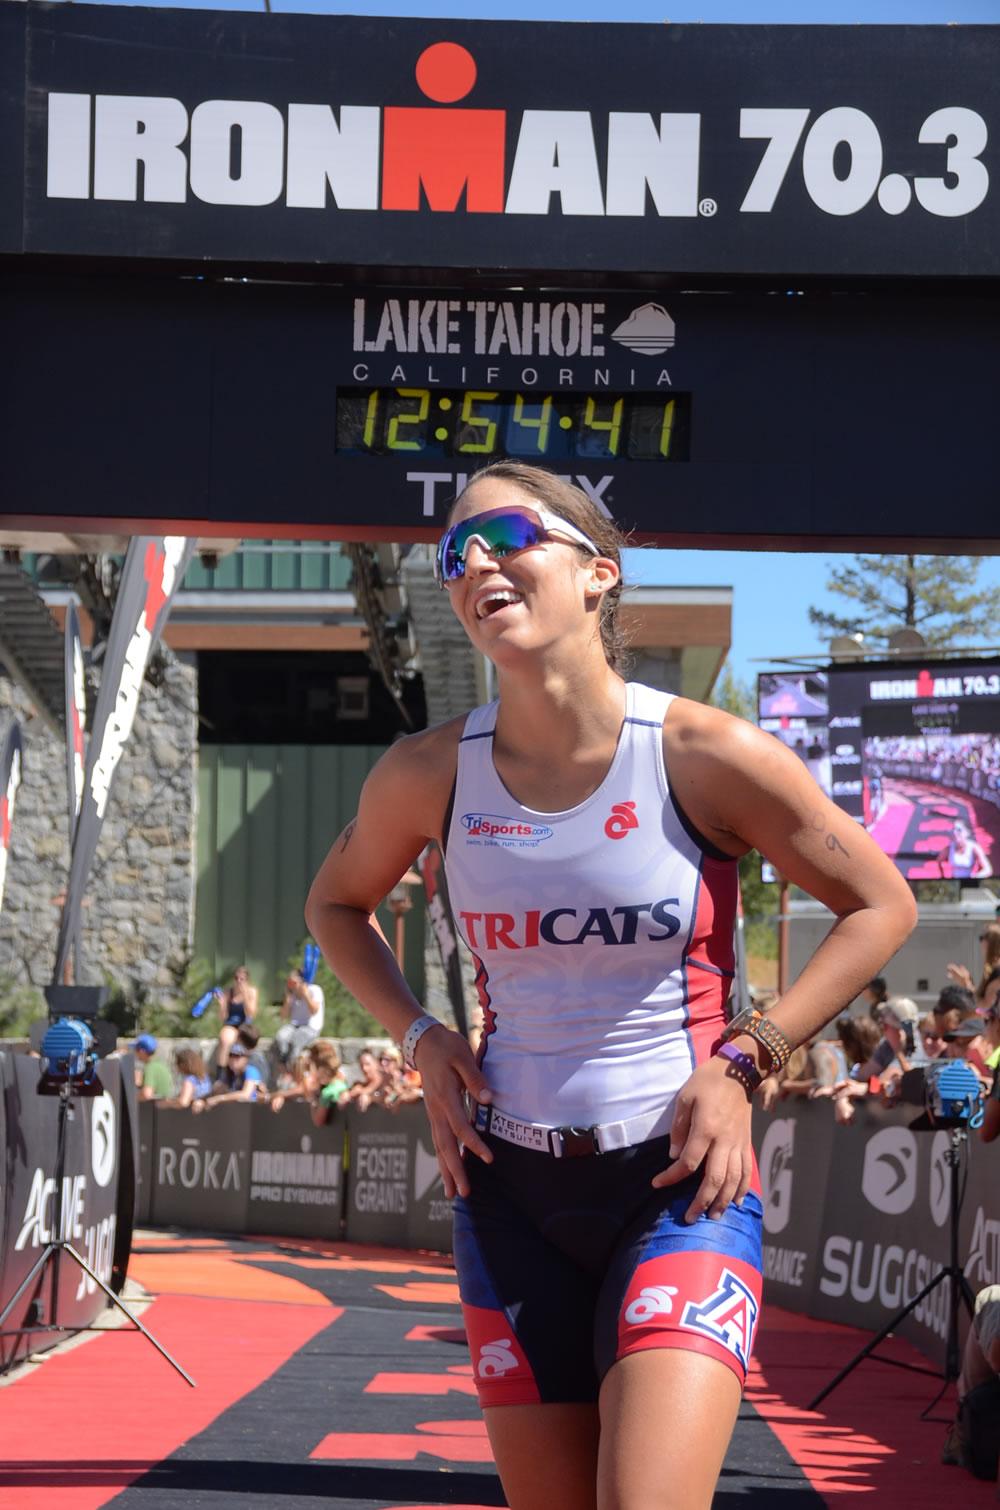 Erica Clevenger wins Ironman 70.3 Lake Tahoe